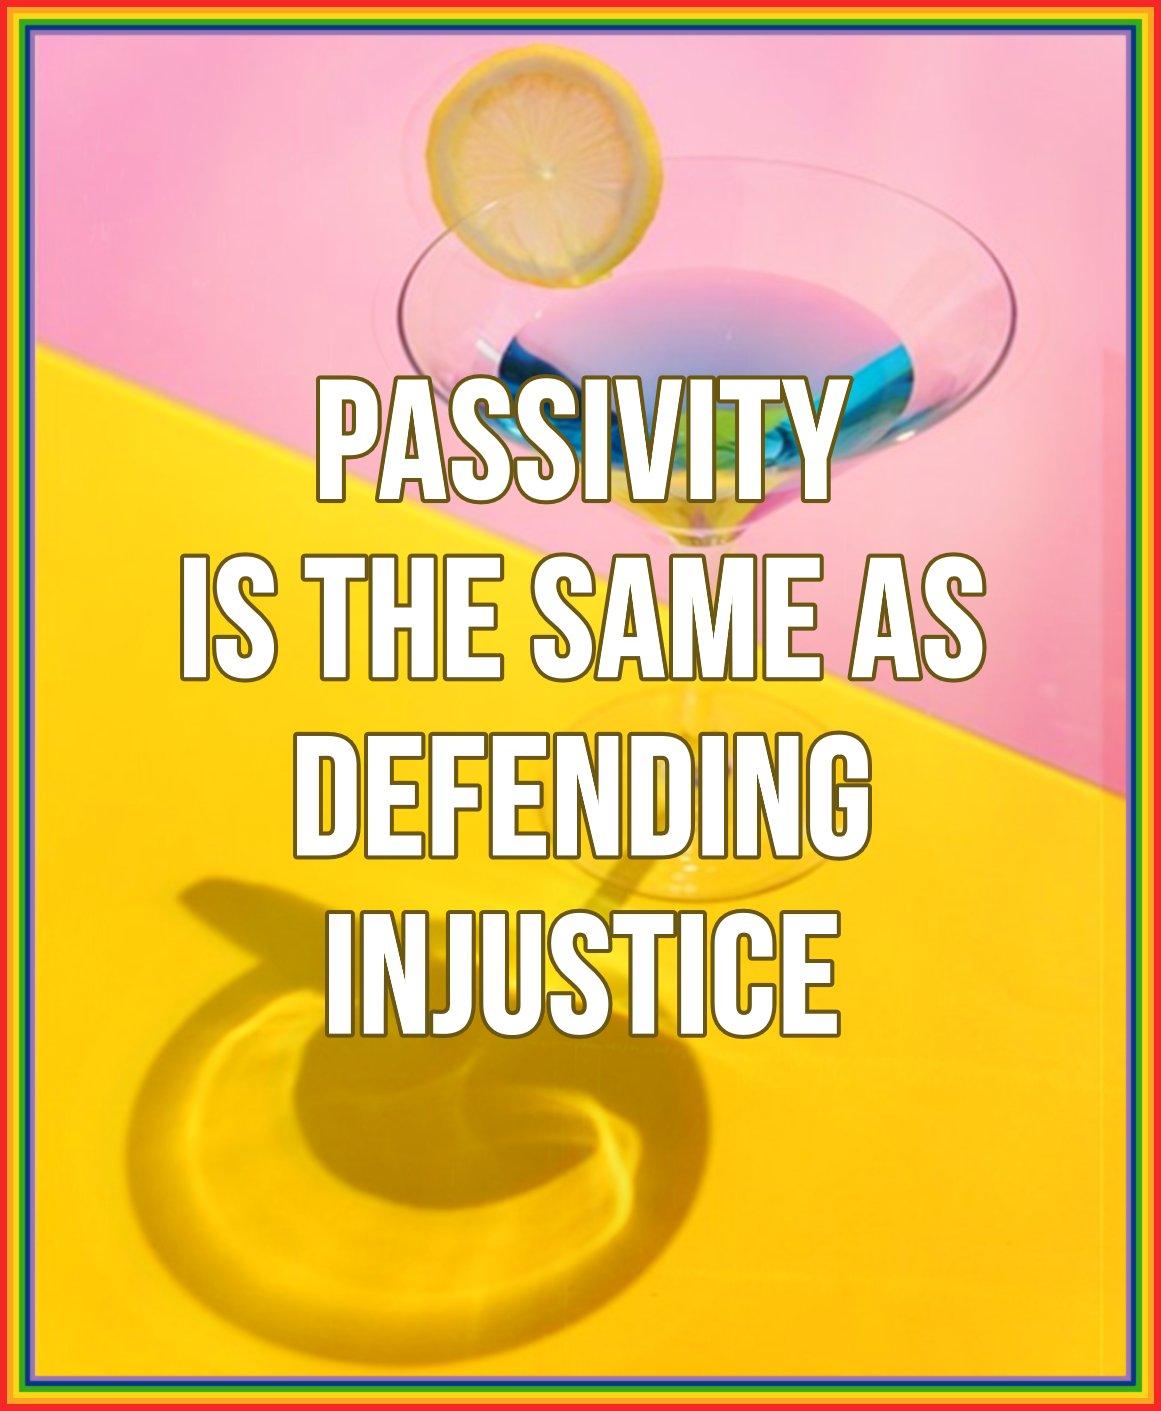 Quote Passivity is the same as defending injustice. Deepak Chopra